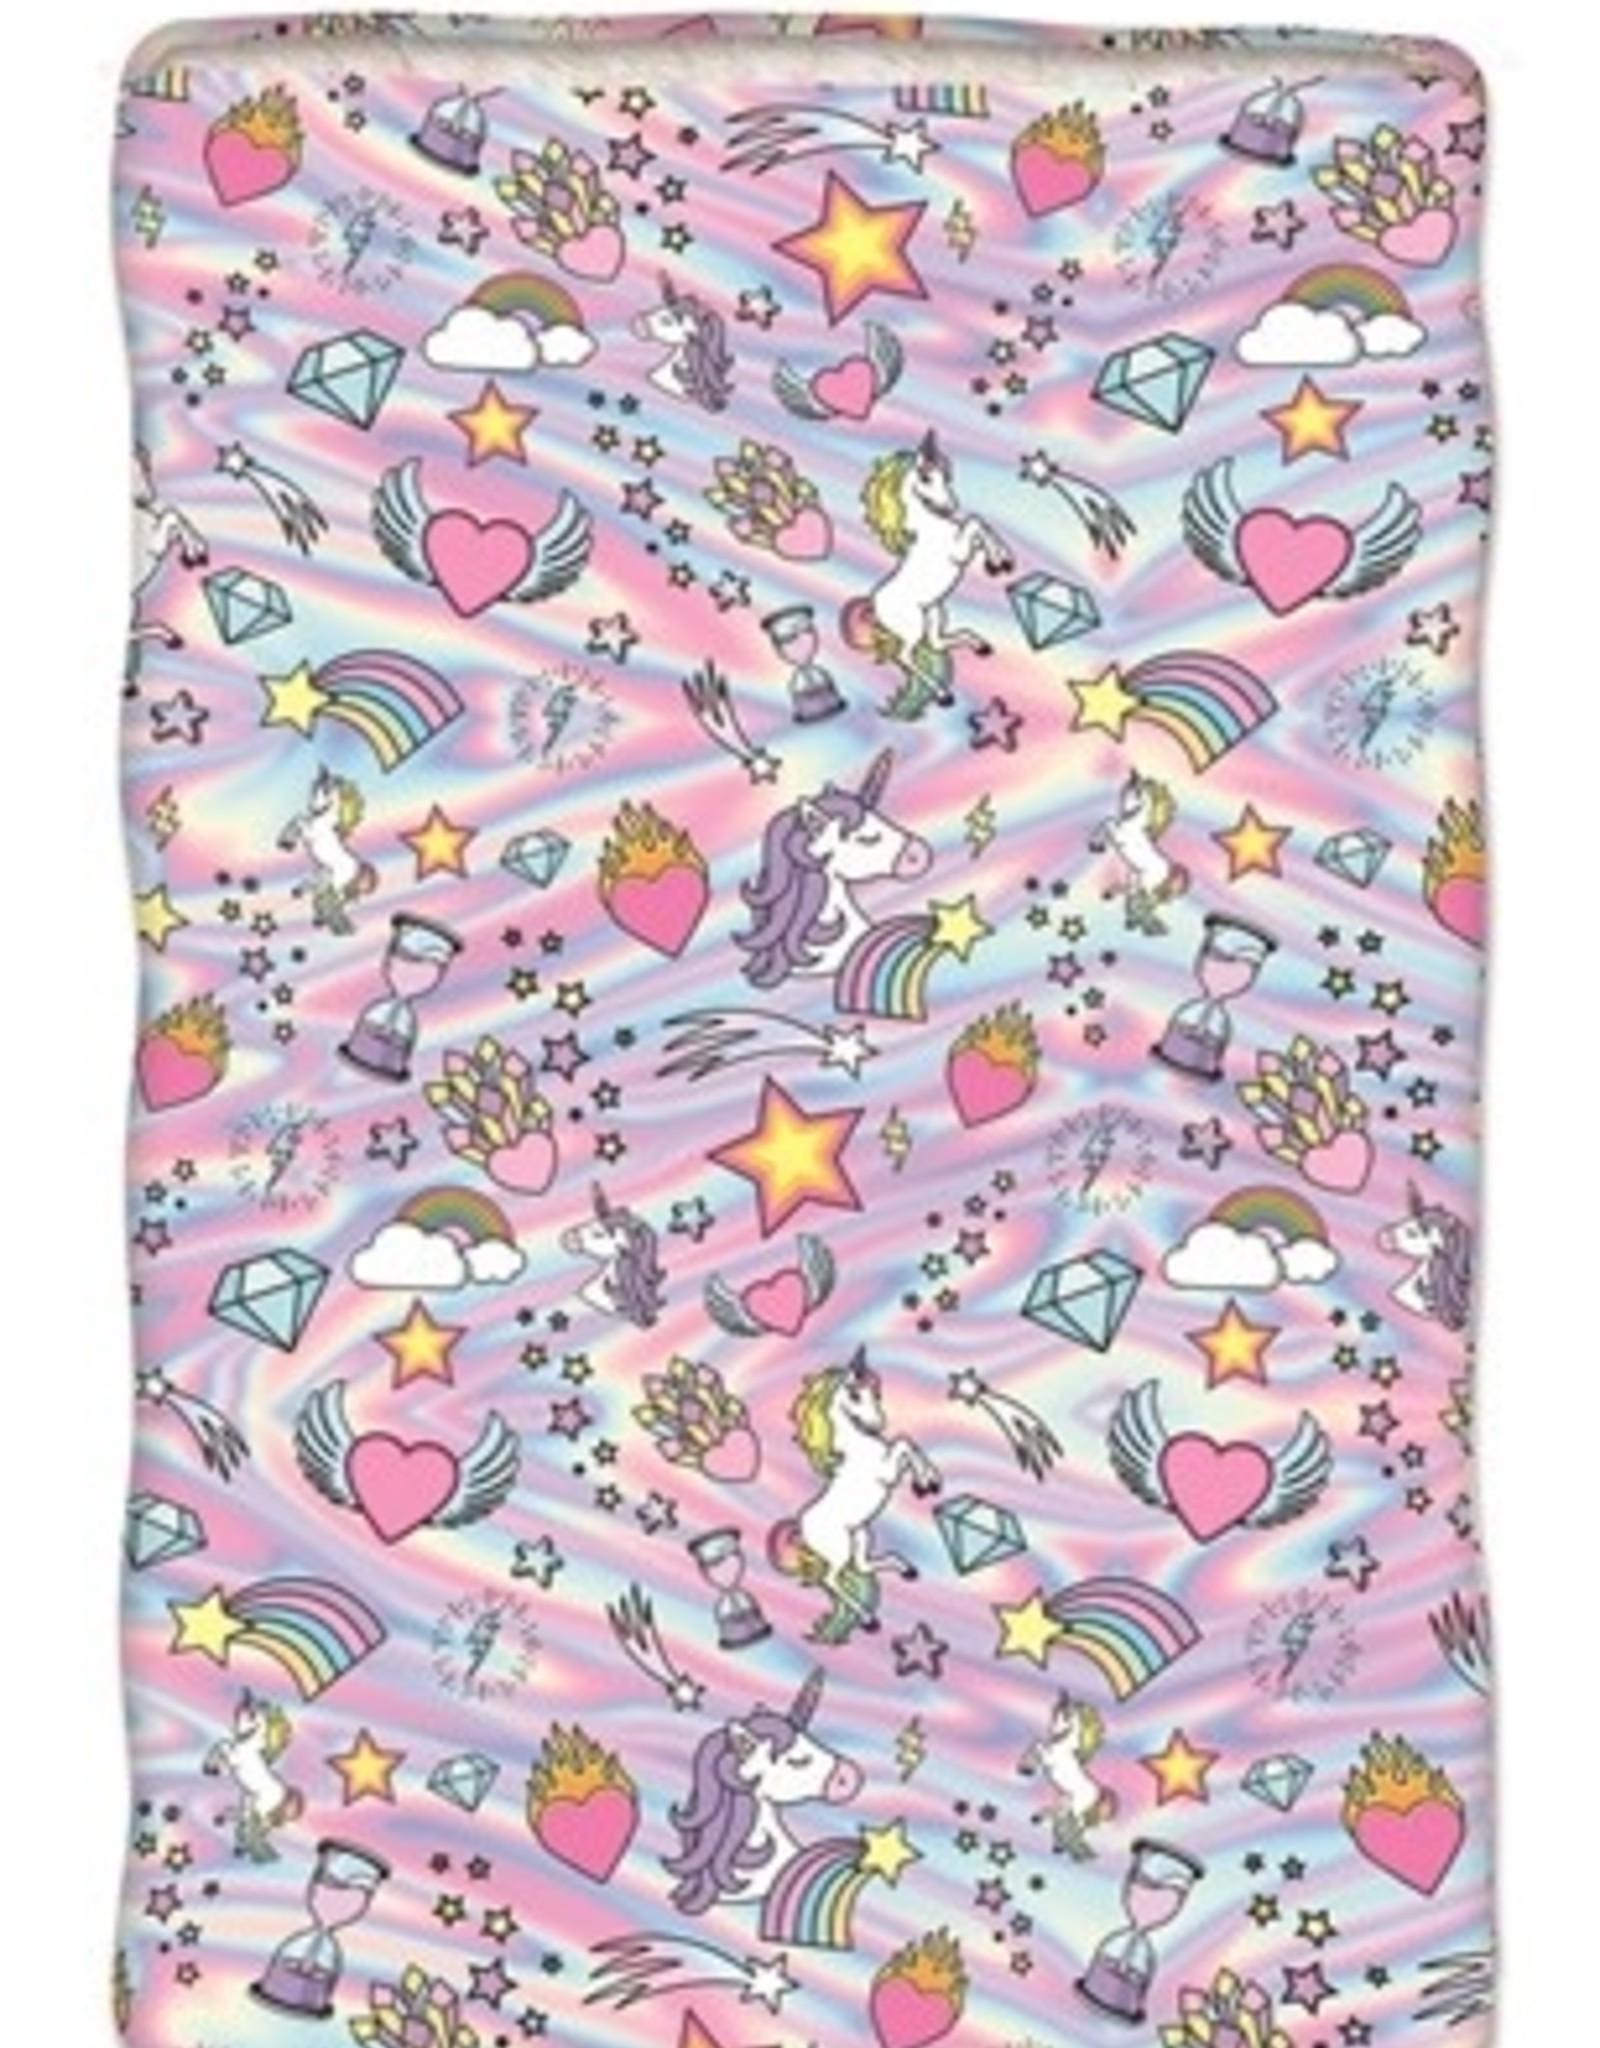 Top Trenz Unicorn Couture Sleep Sack